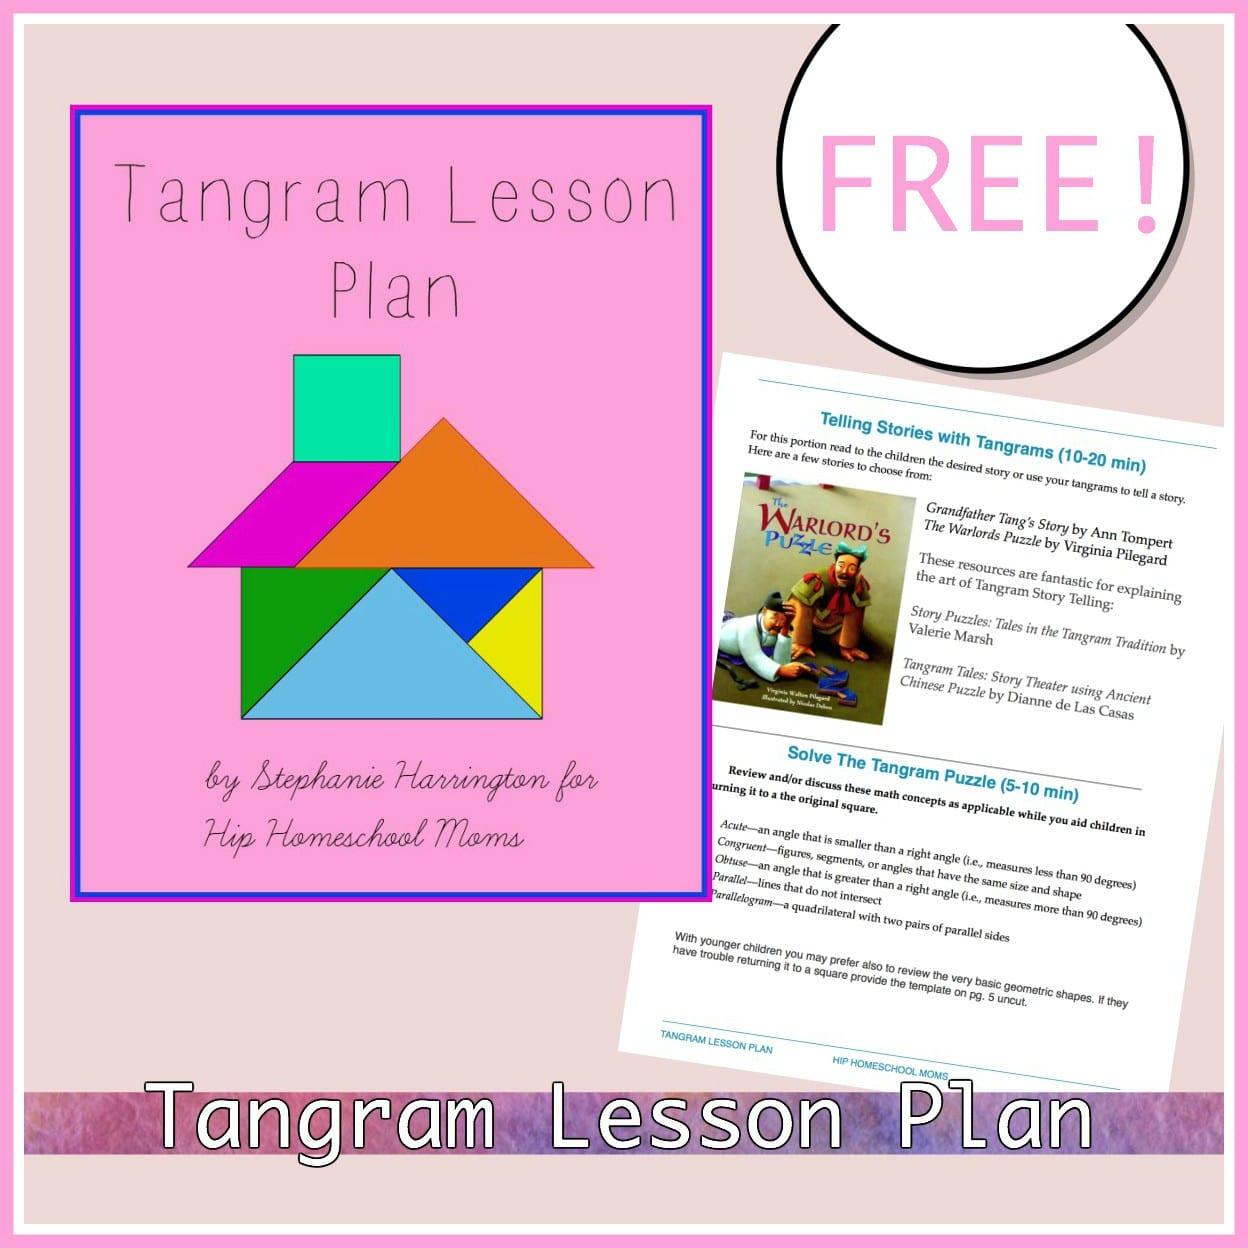 Tangram Lesson Plan